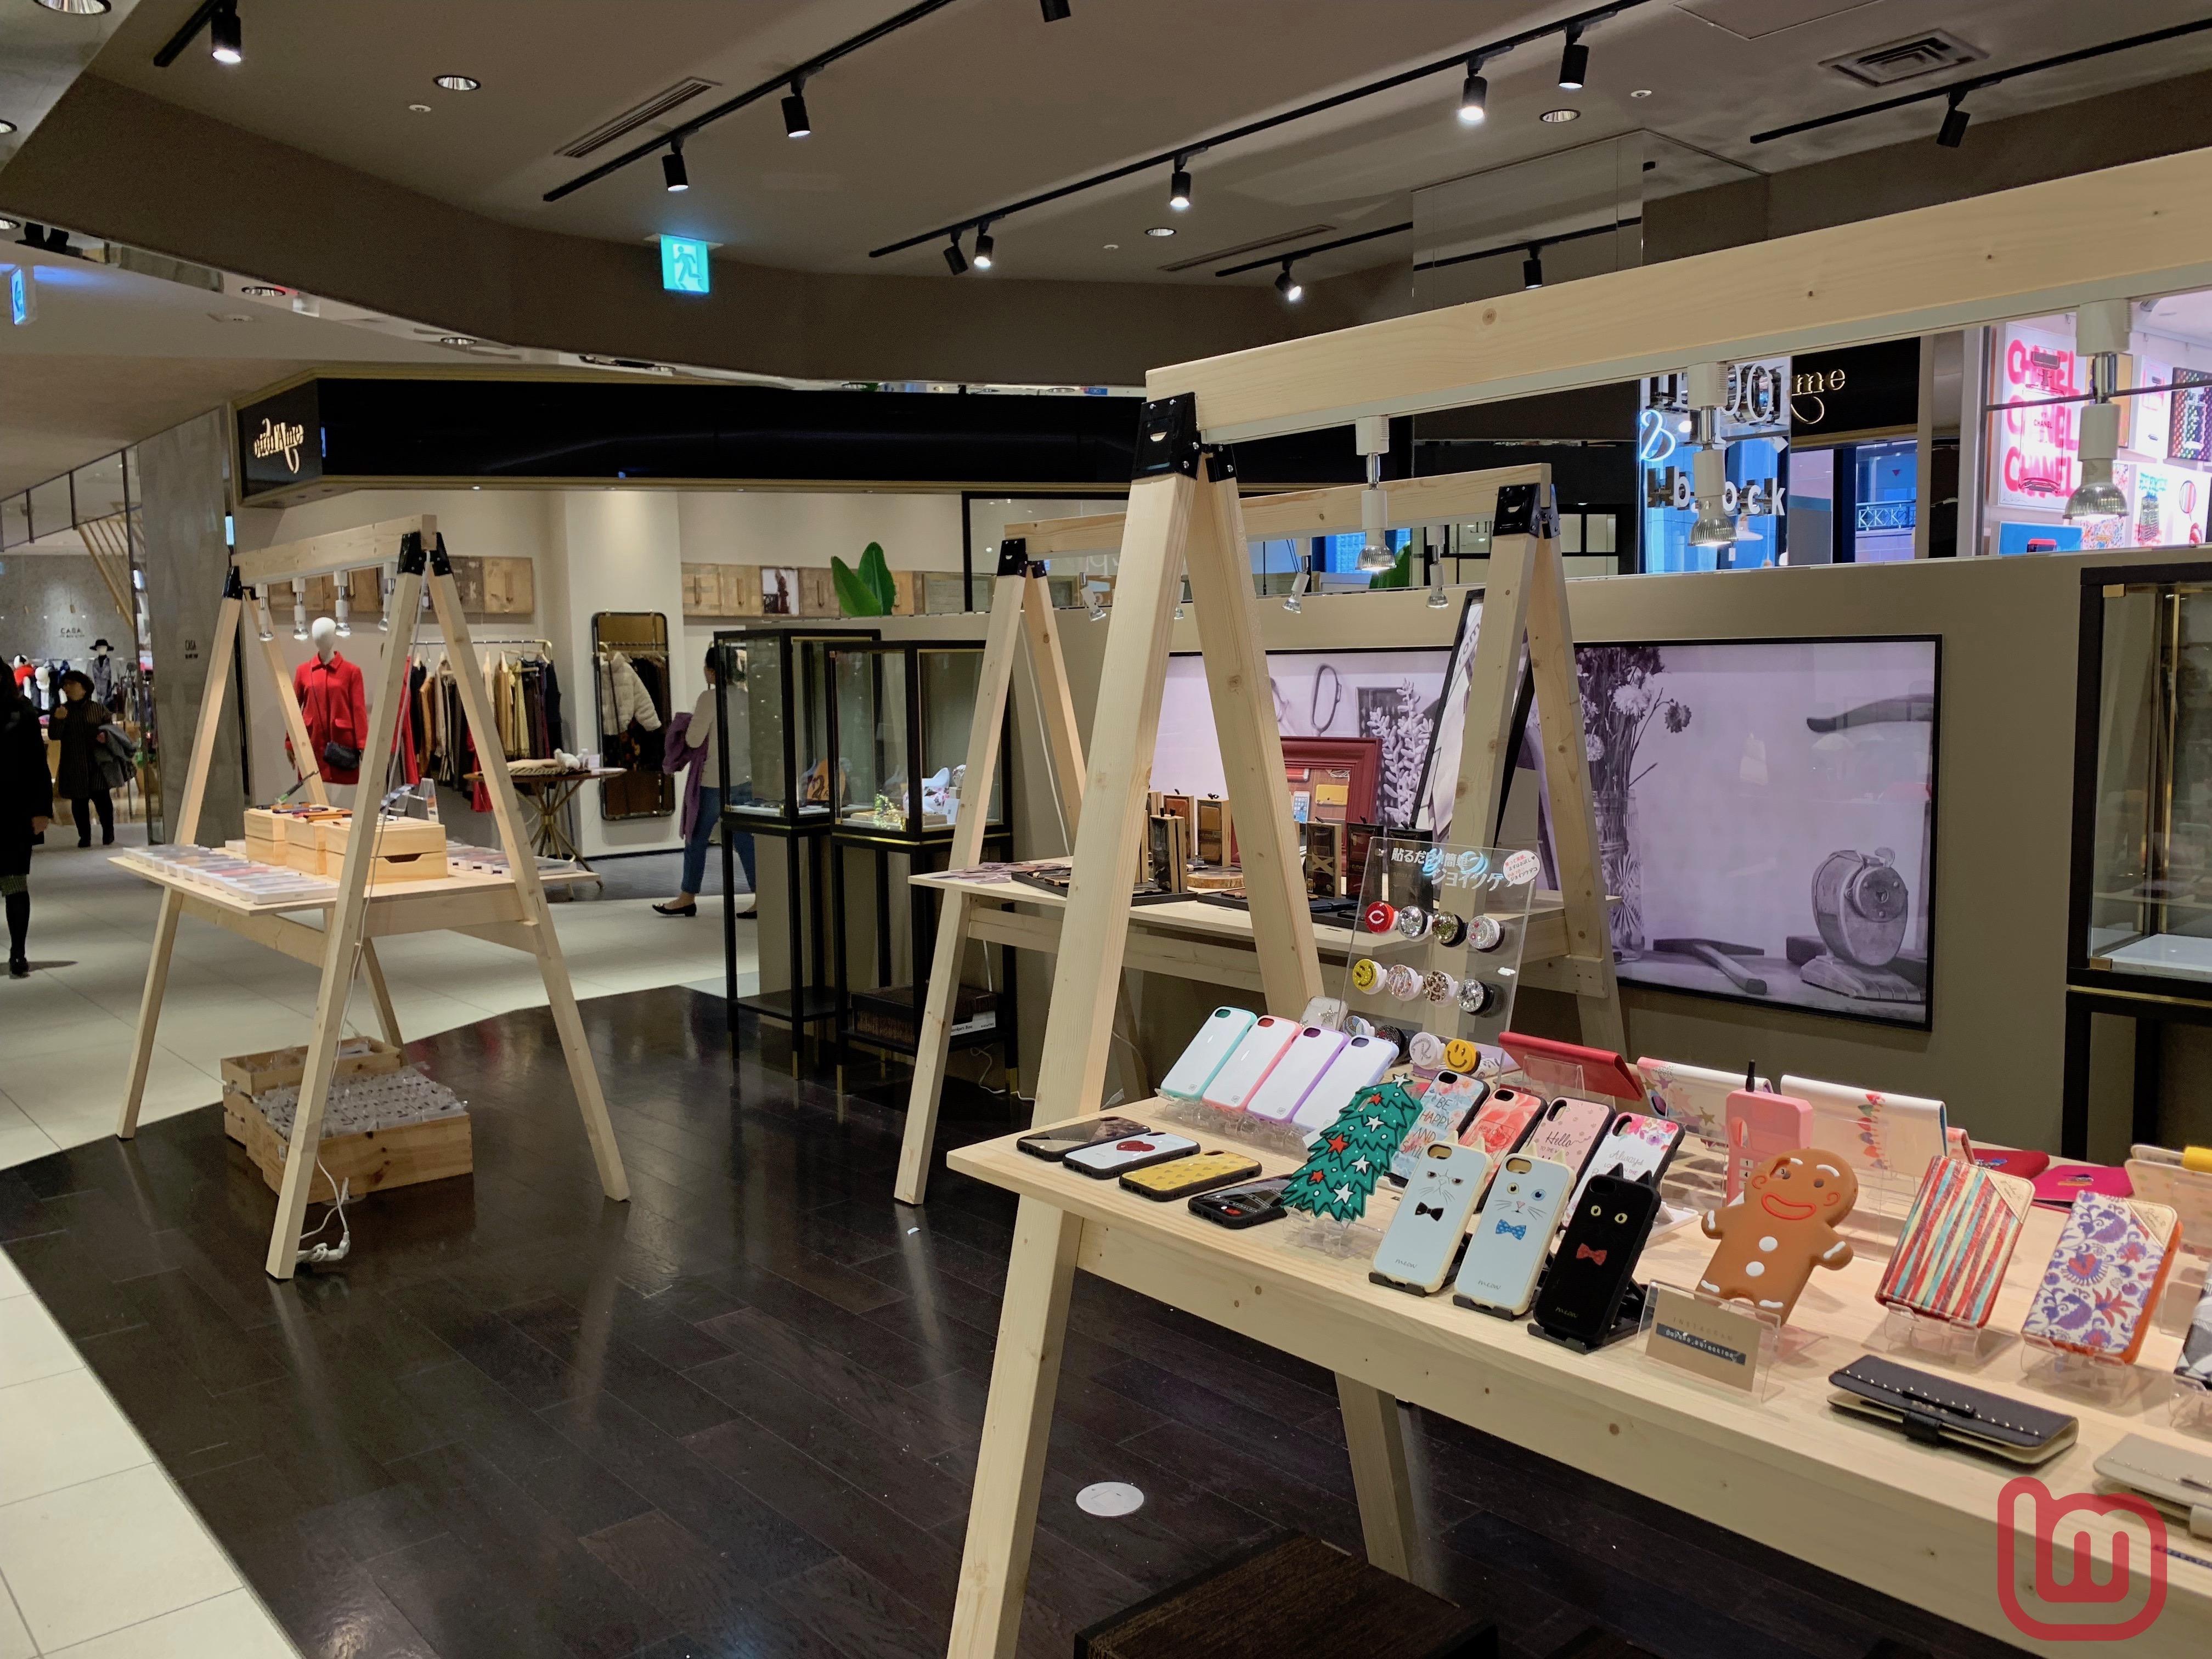 iPhoneケース展、「TOKYU PLAZA GINZA」に期間限定のポップアップストア「Smart Winter Collection」をオープン